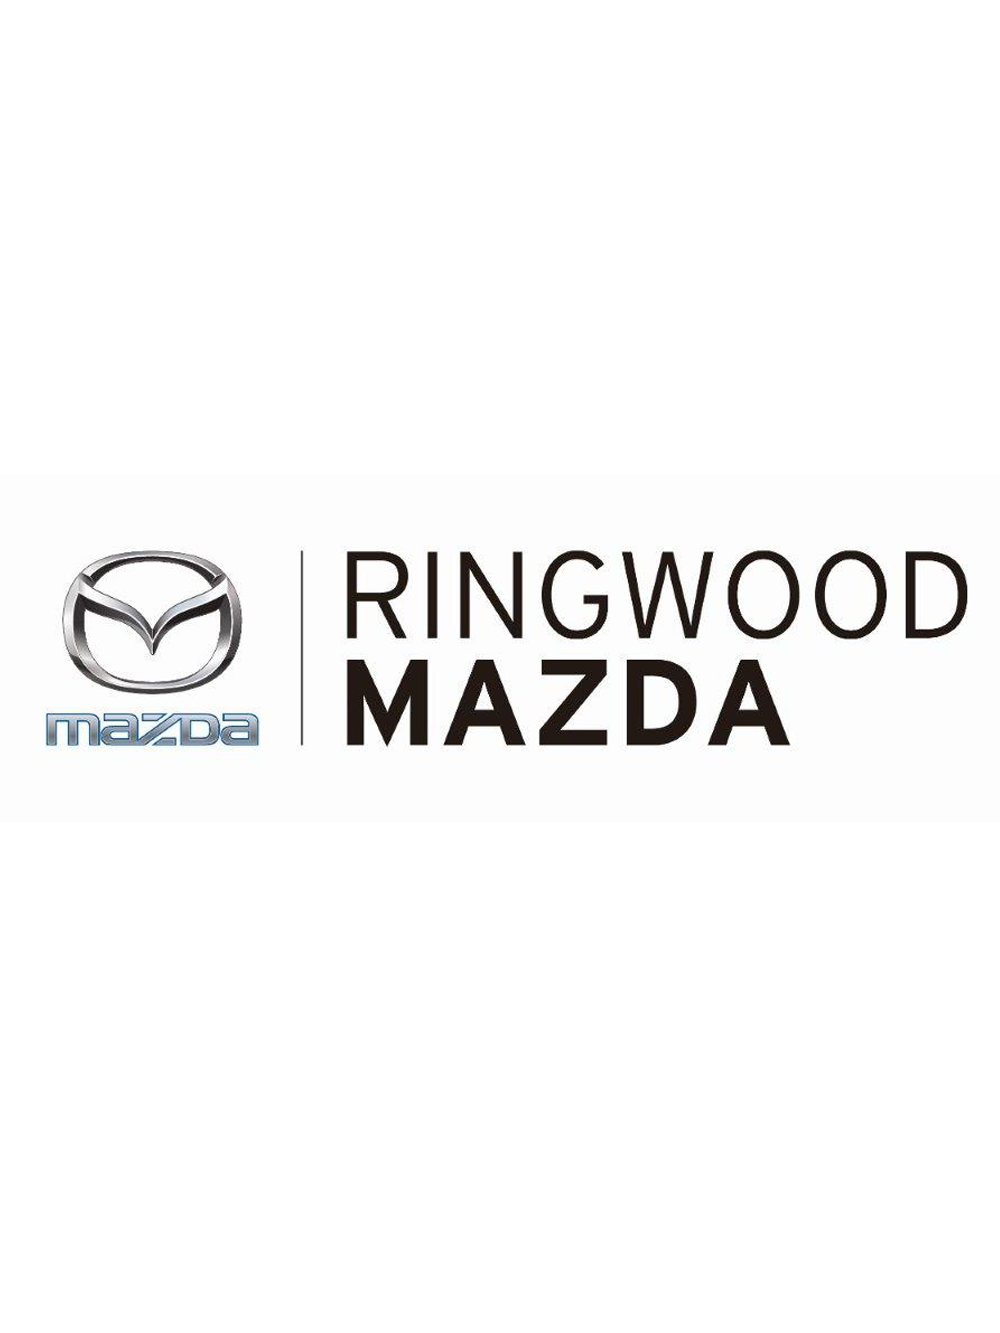 ringwood-mazda_1000x1333.png